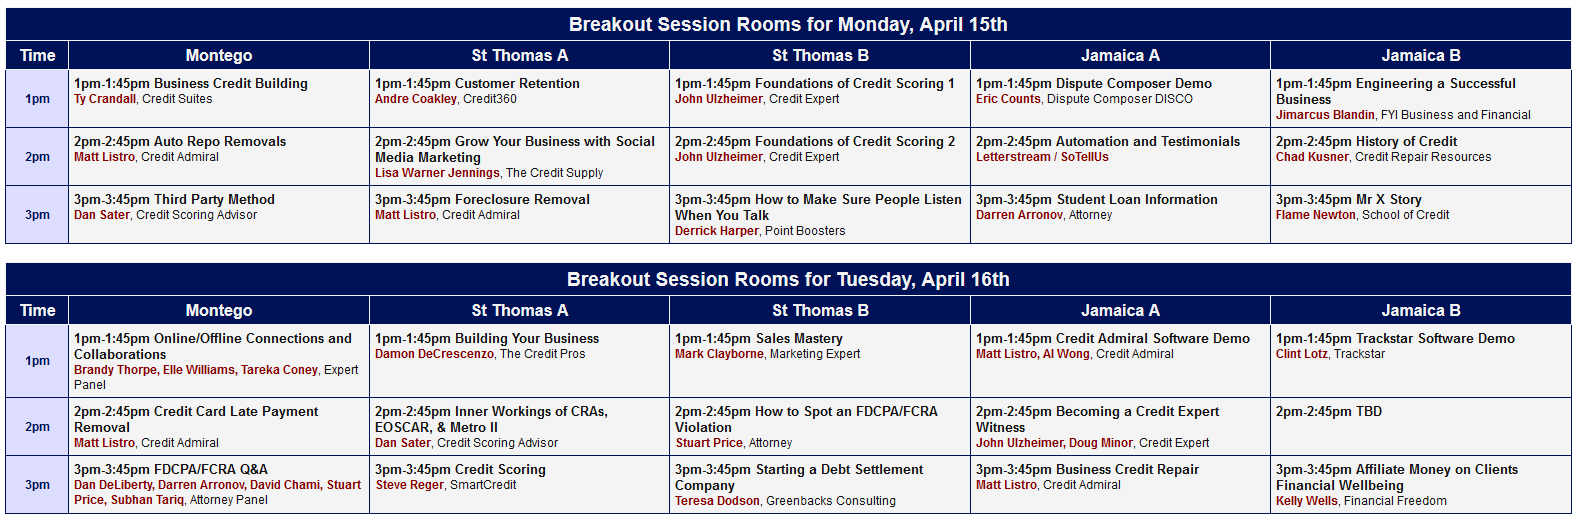 2019-04-09-breakout-schedule